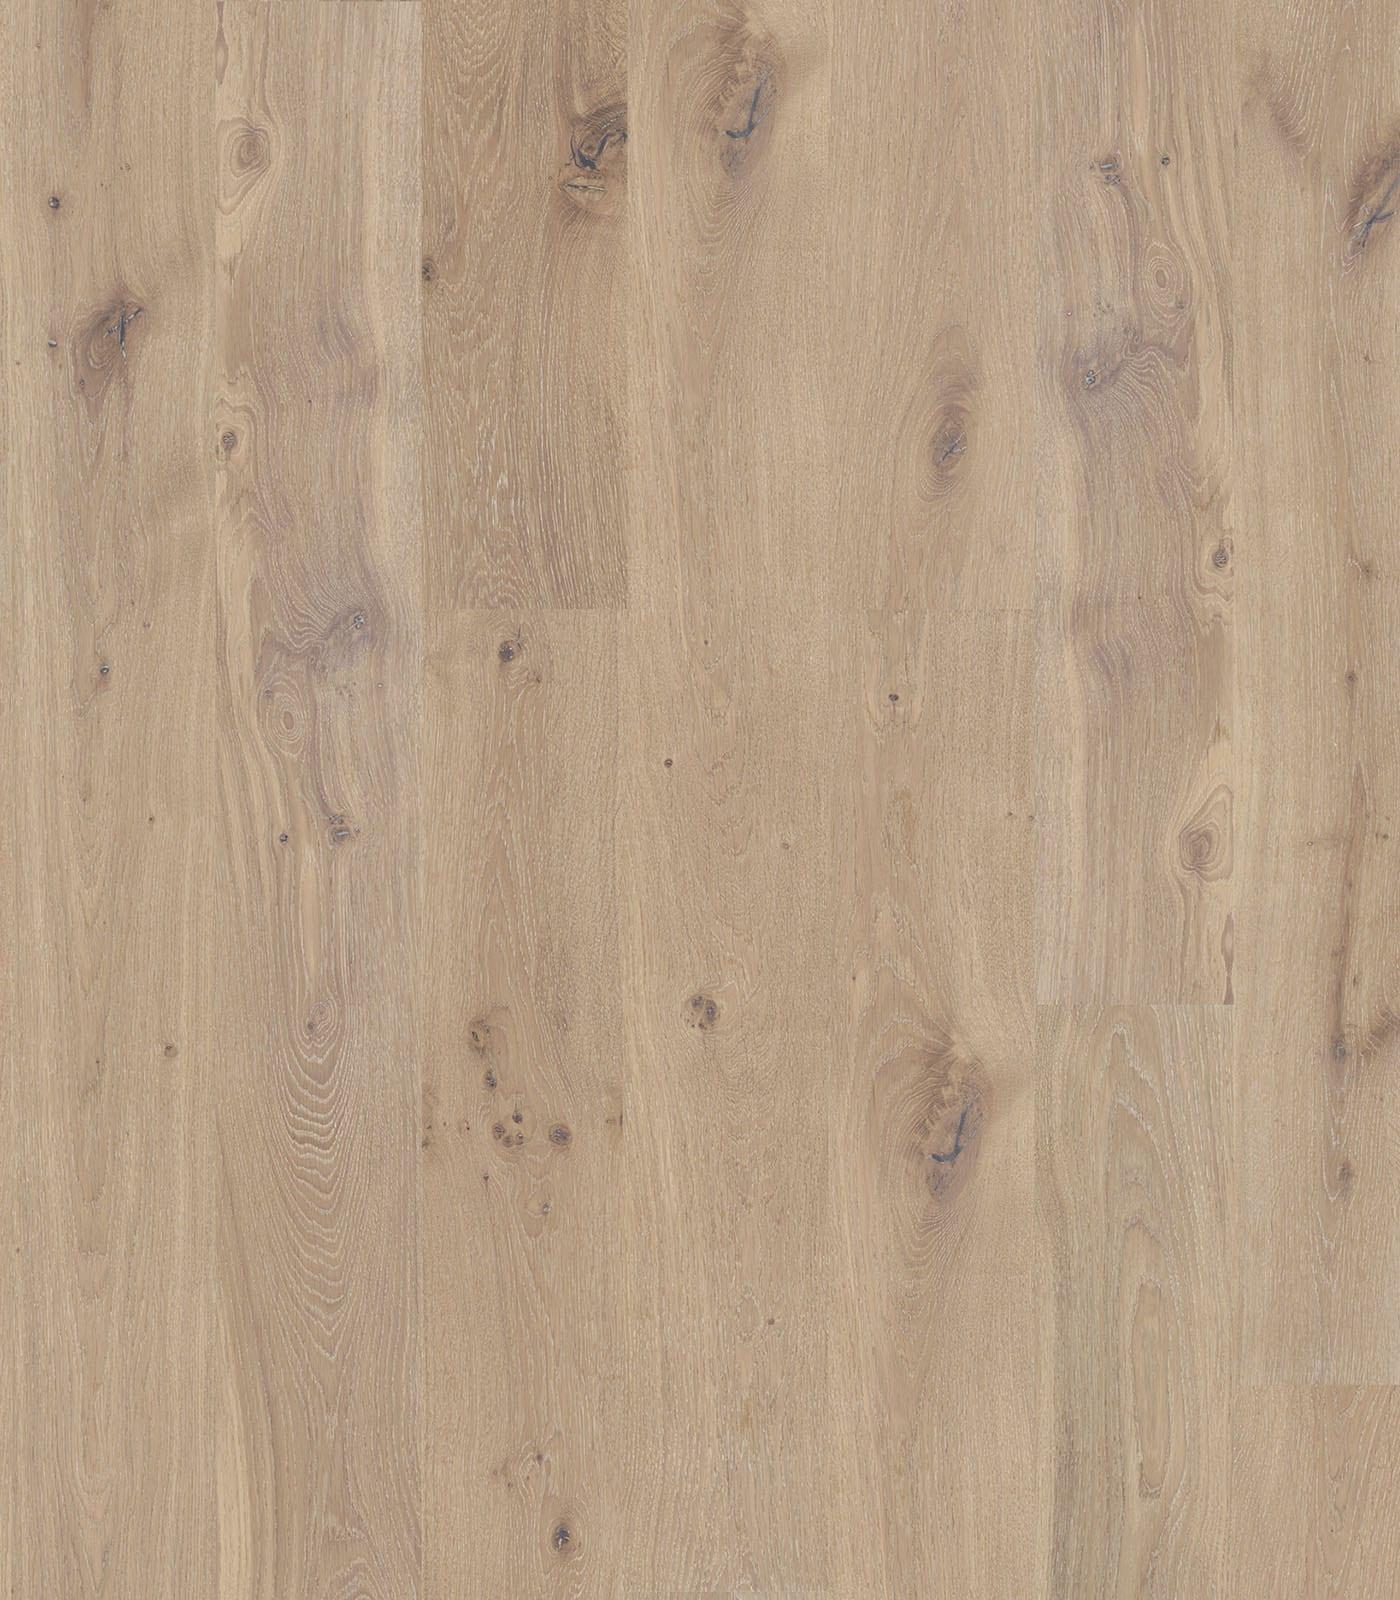 Rocky Mountains-european Oak flooring-Antique collection-flat